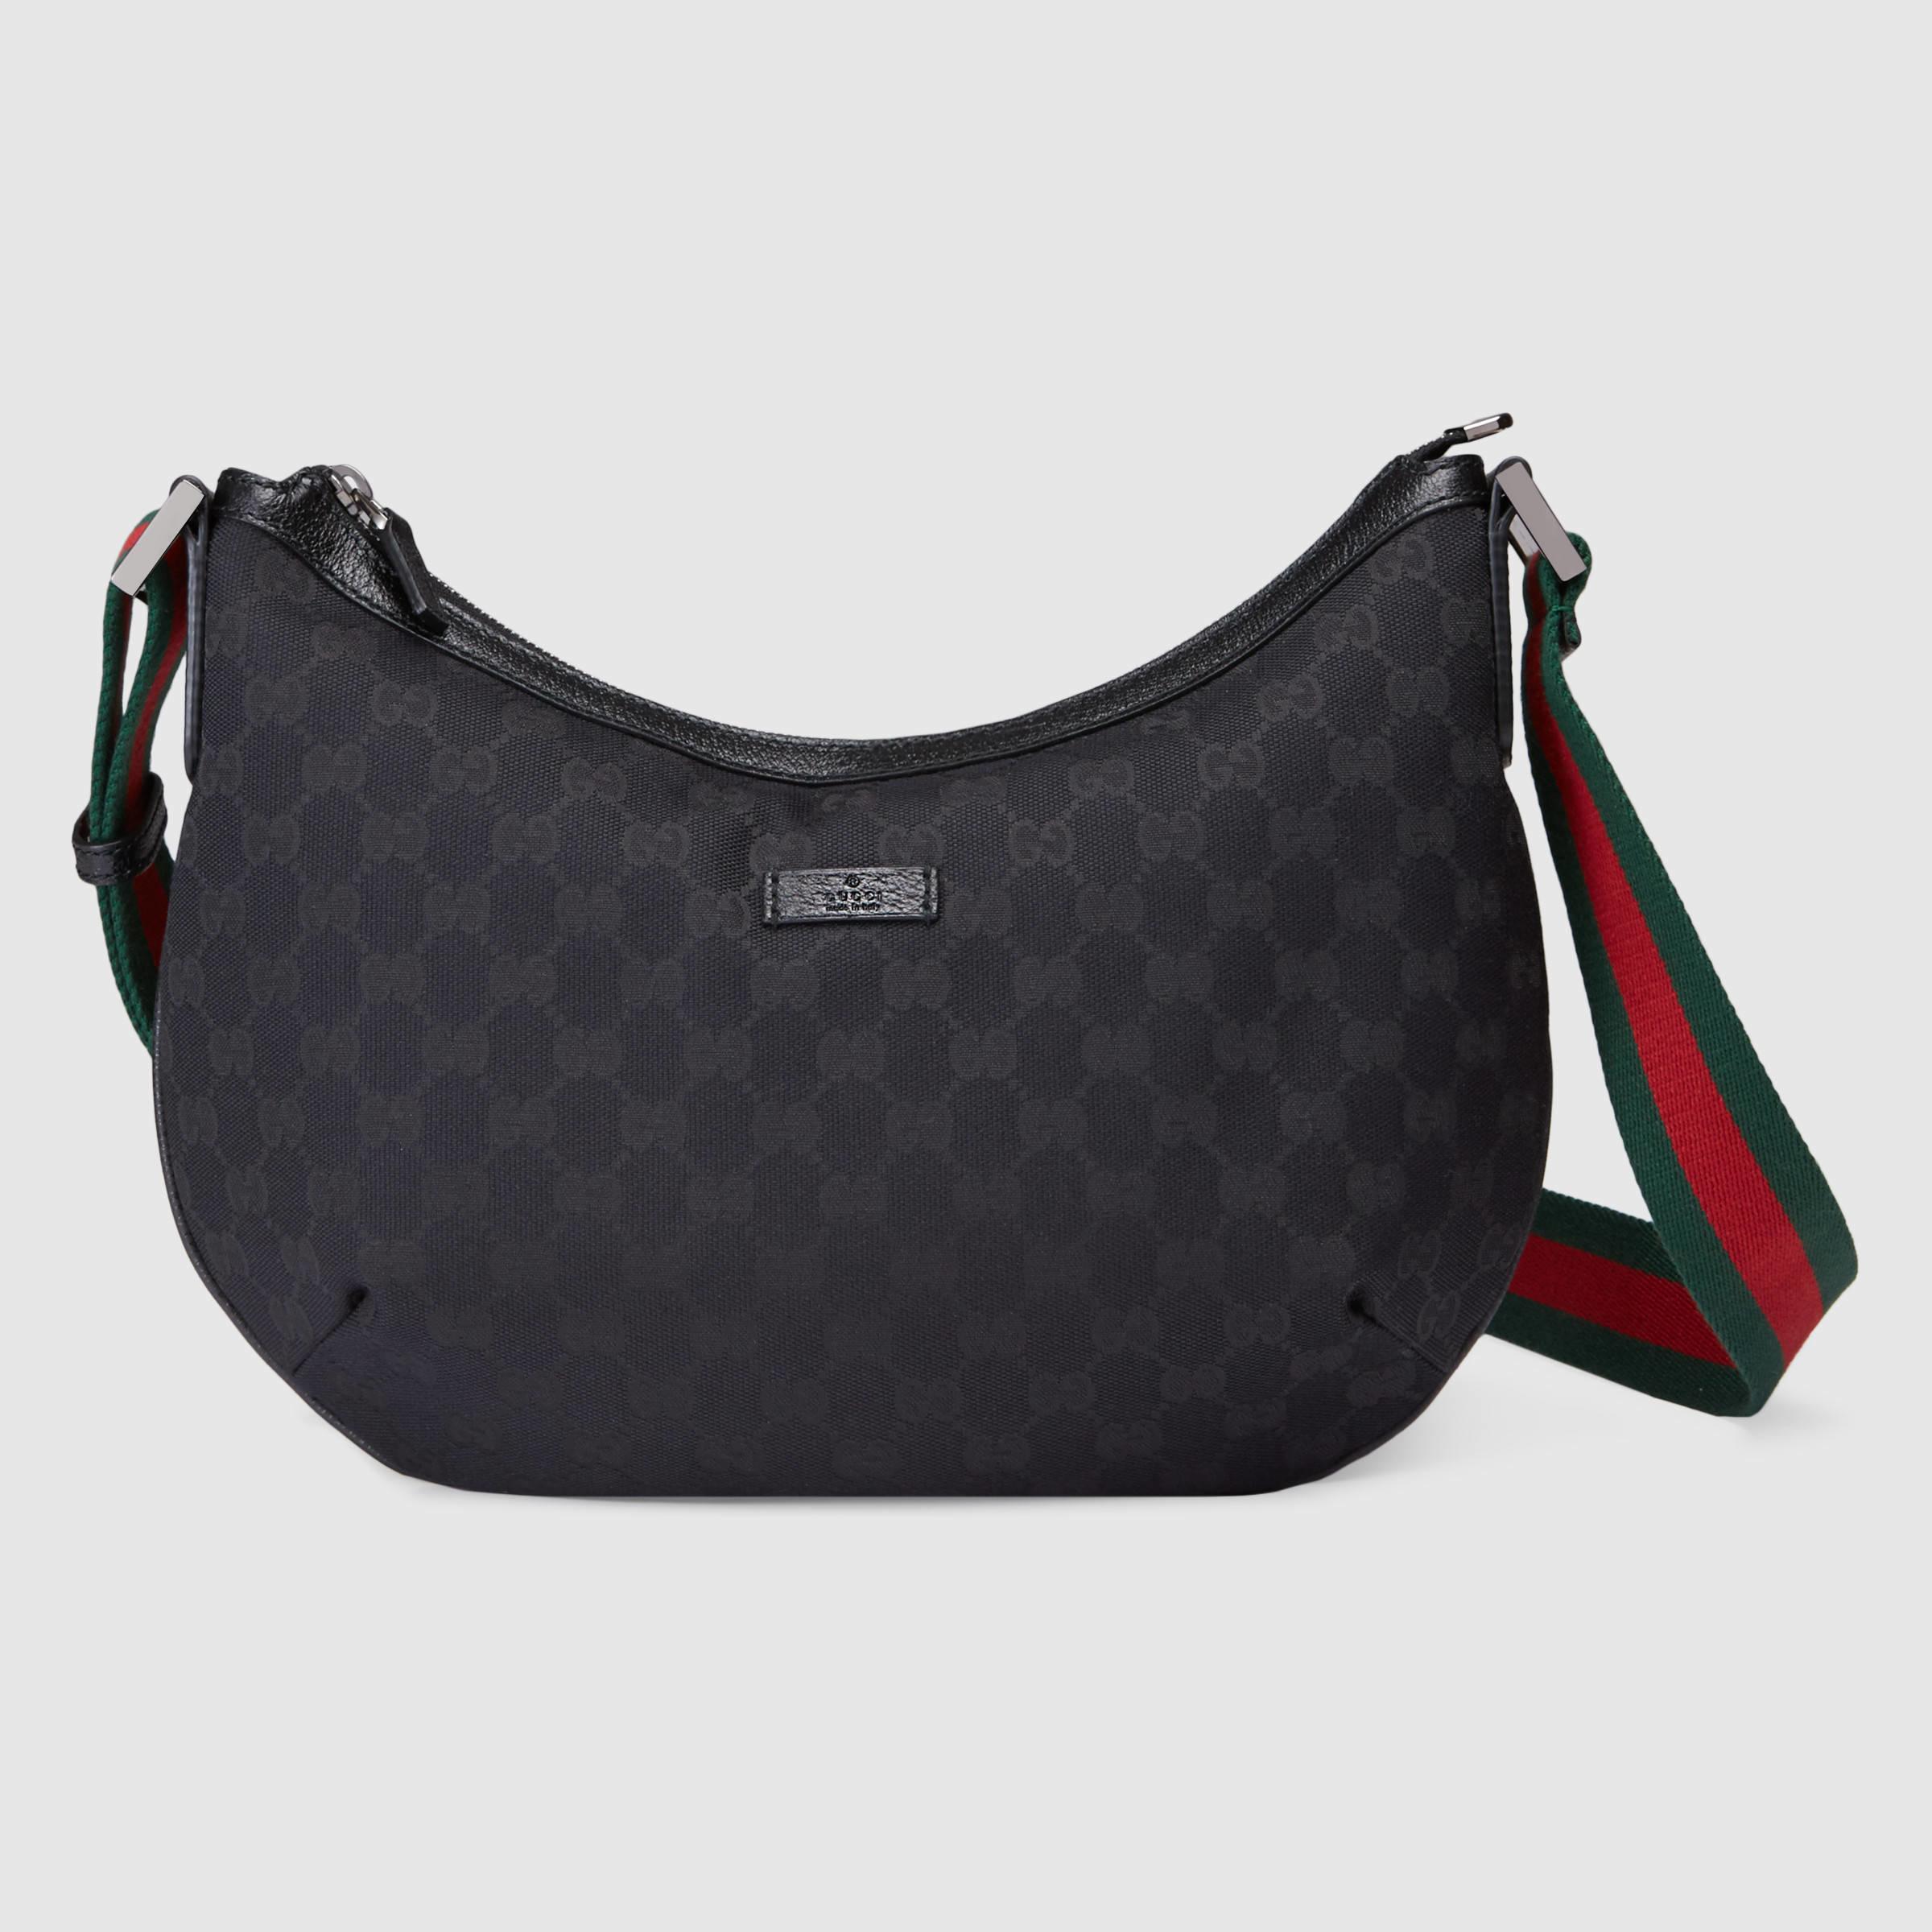 cd7498caa4e Lyst - Gucci Original Gg Canvas Messenger Bag in Green for Men